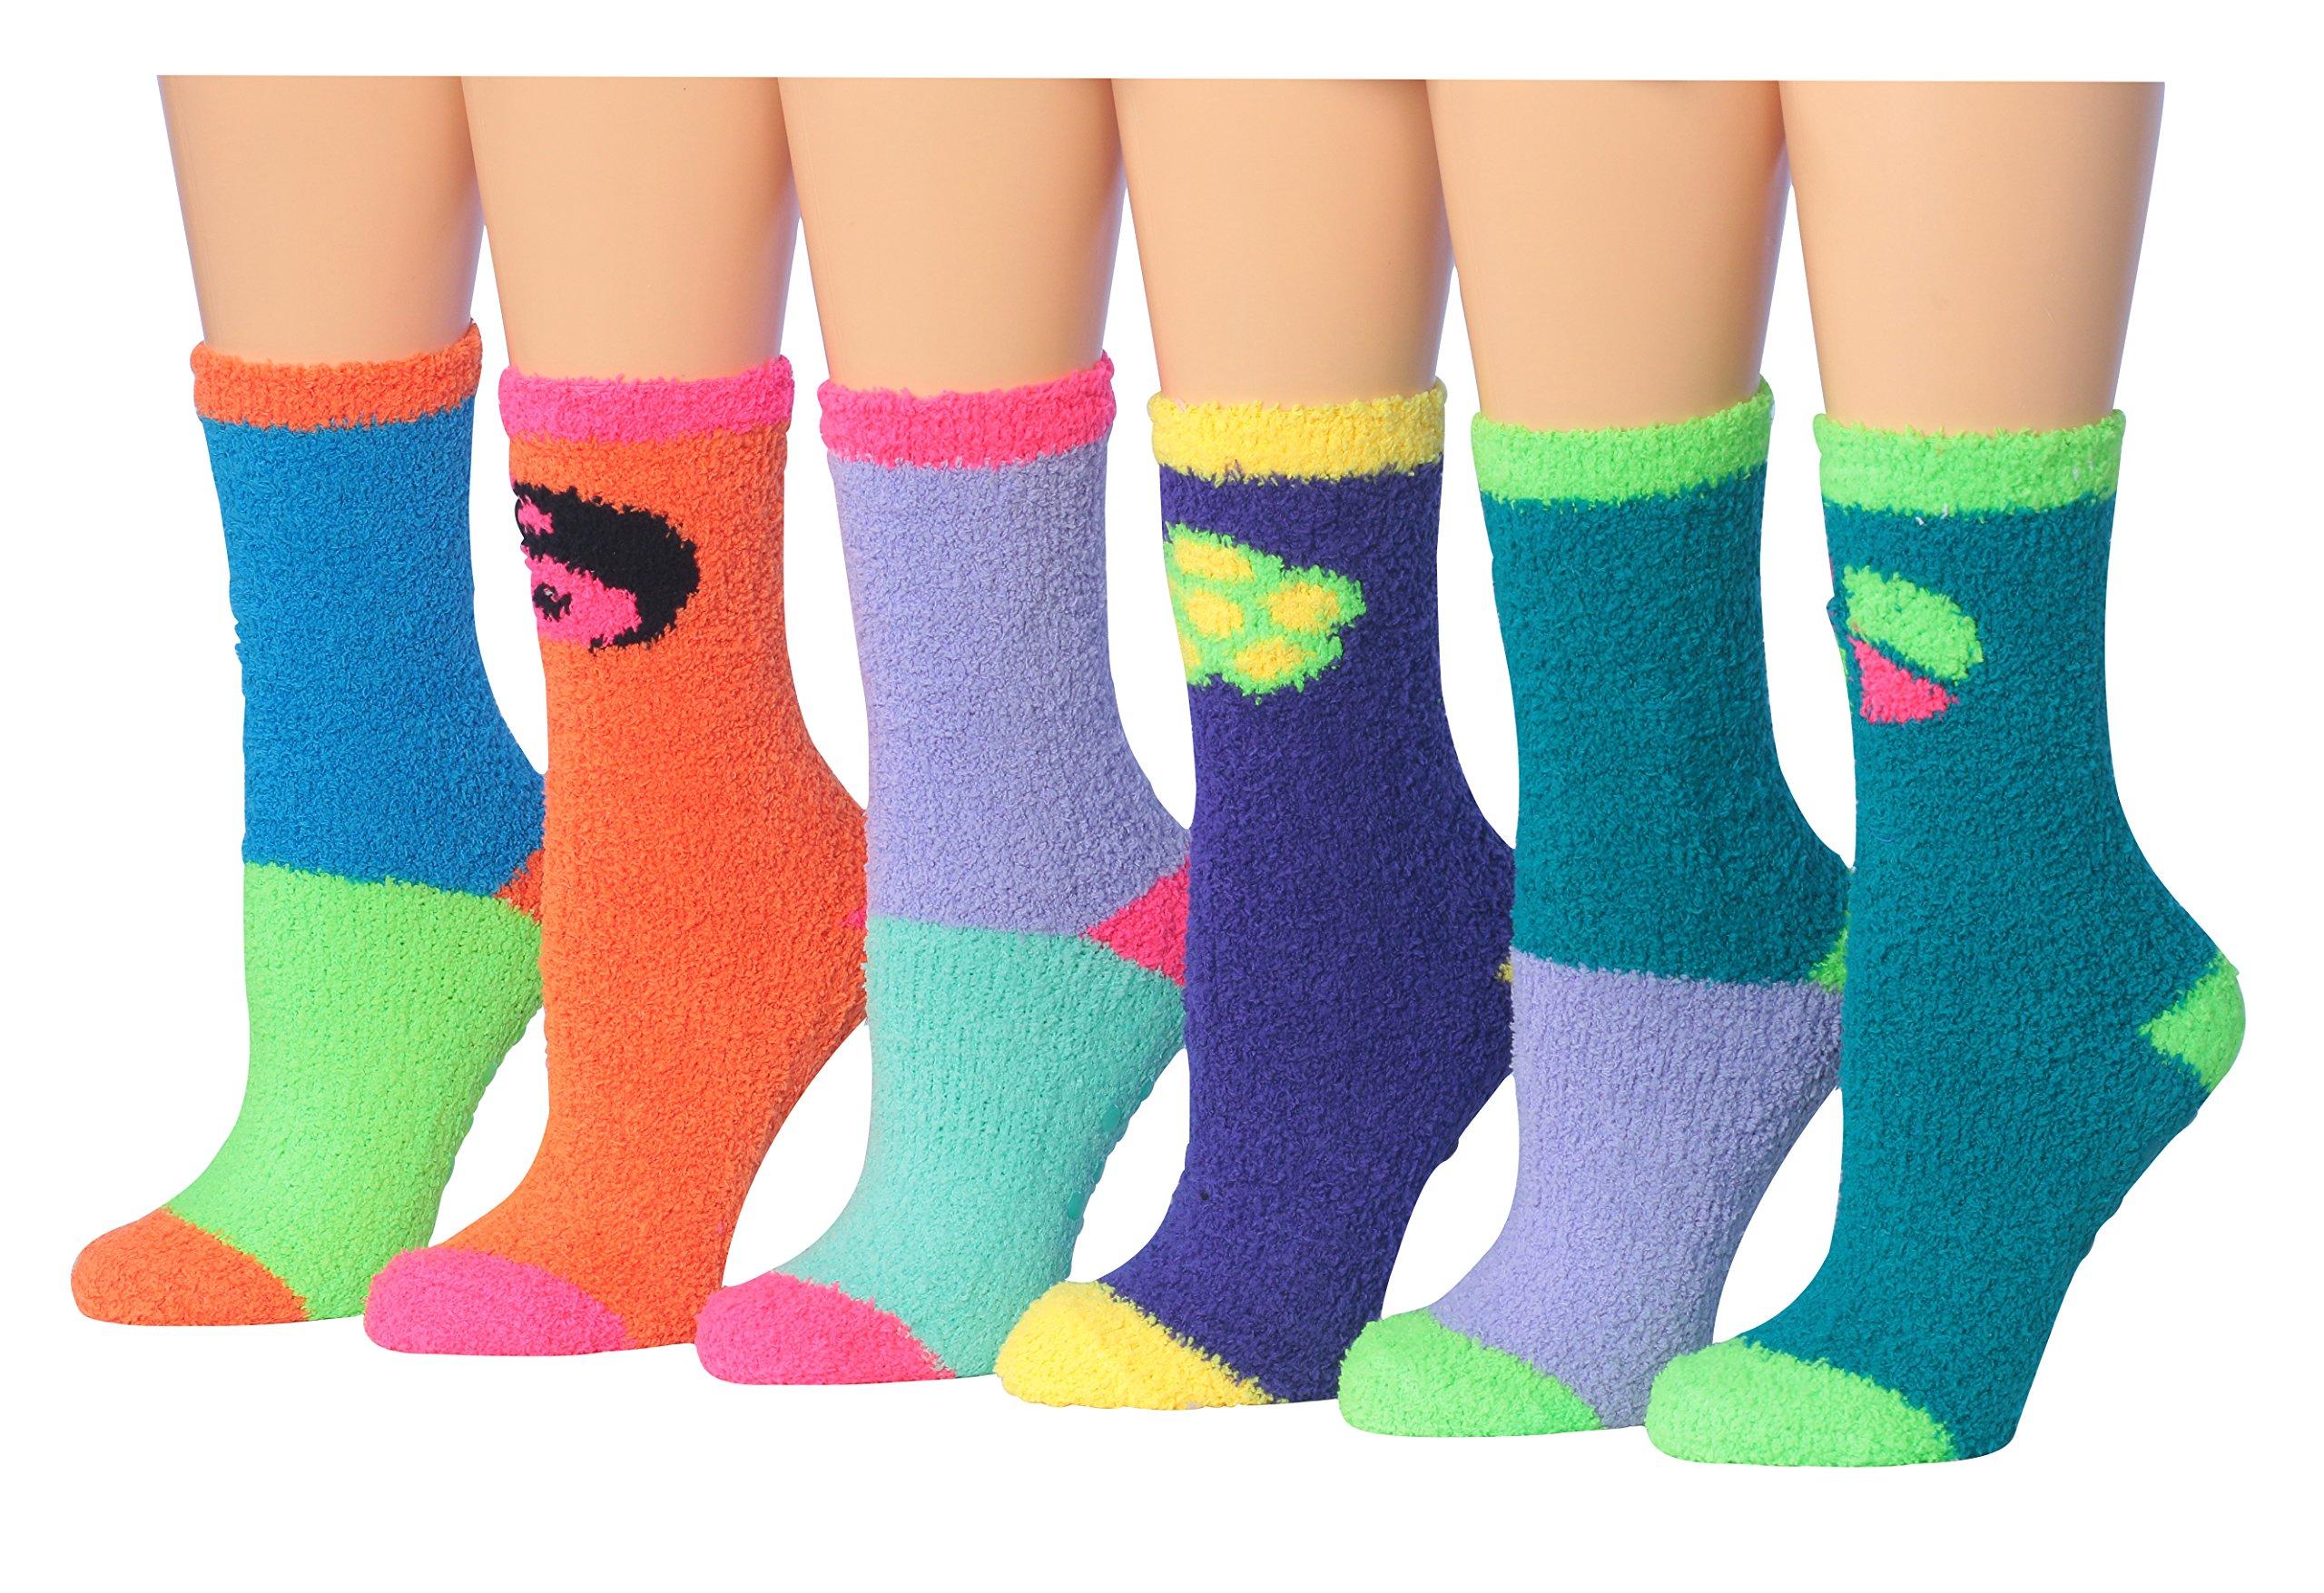 Tipi Toe Women's 6-Pairs Novelty Peace Love Anti-Skid Soft Fuzzy Cozy Winter Crew Socks, (sock size 9-11) Fits shoe size 6-9, FZ13-6